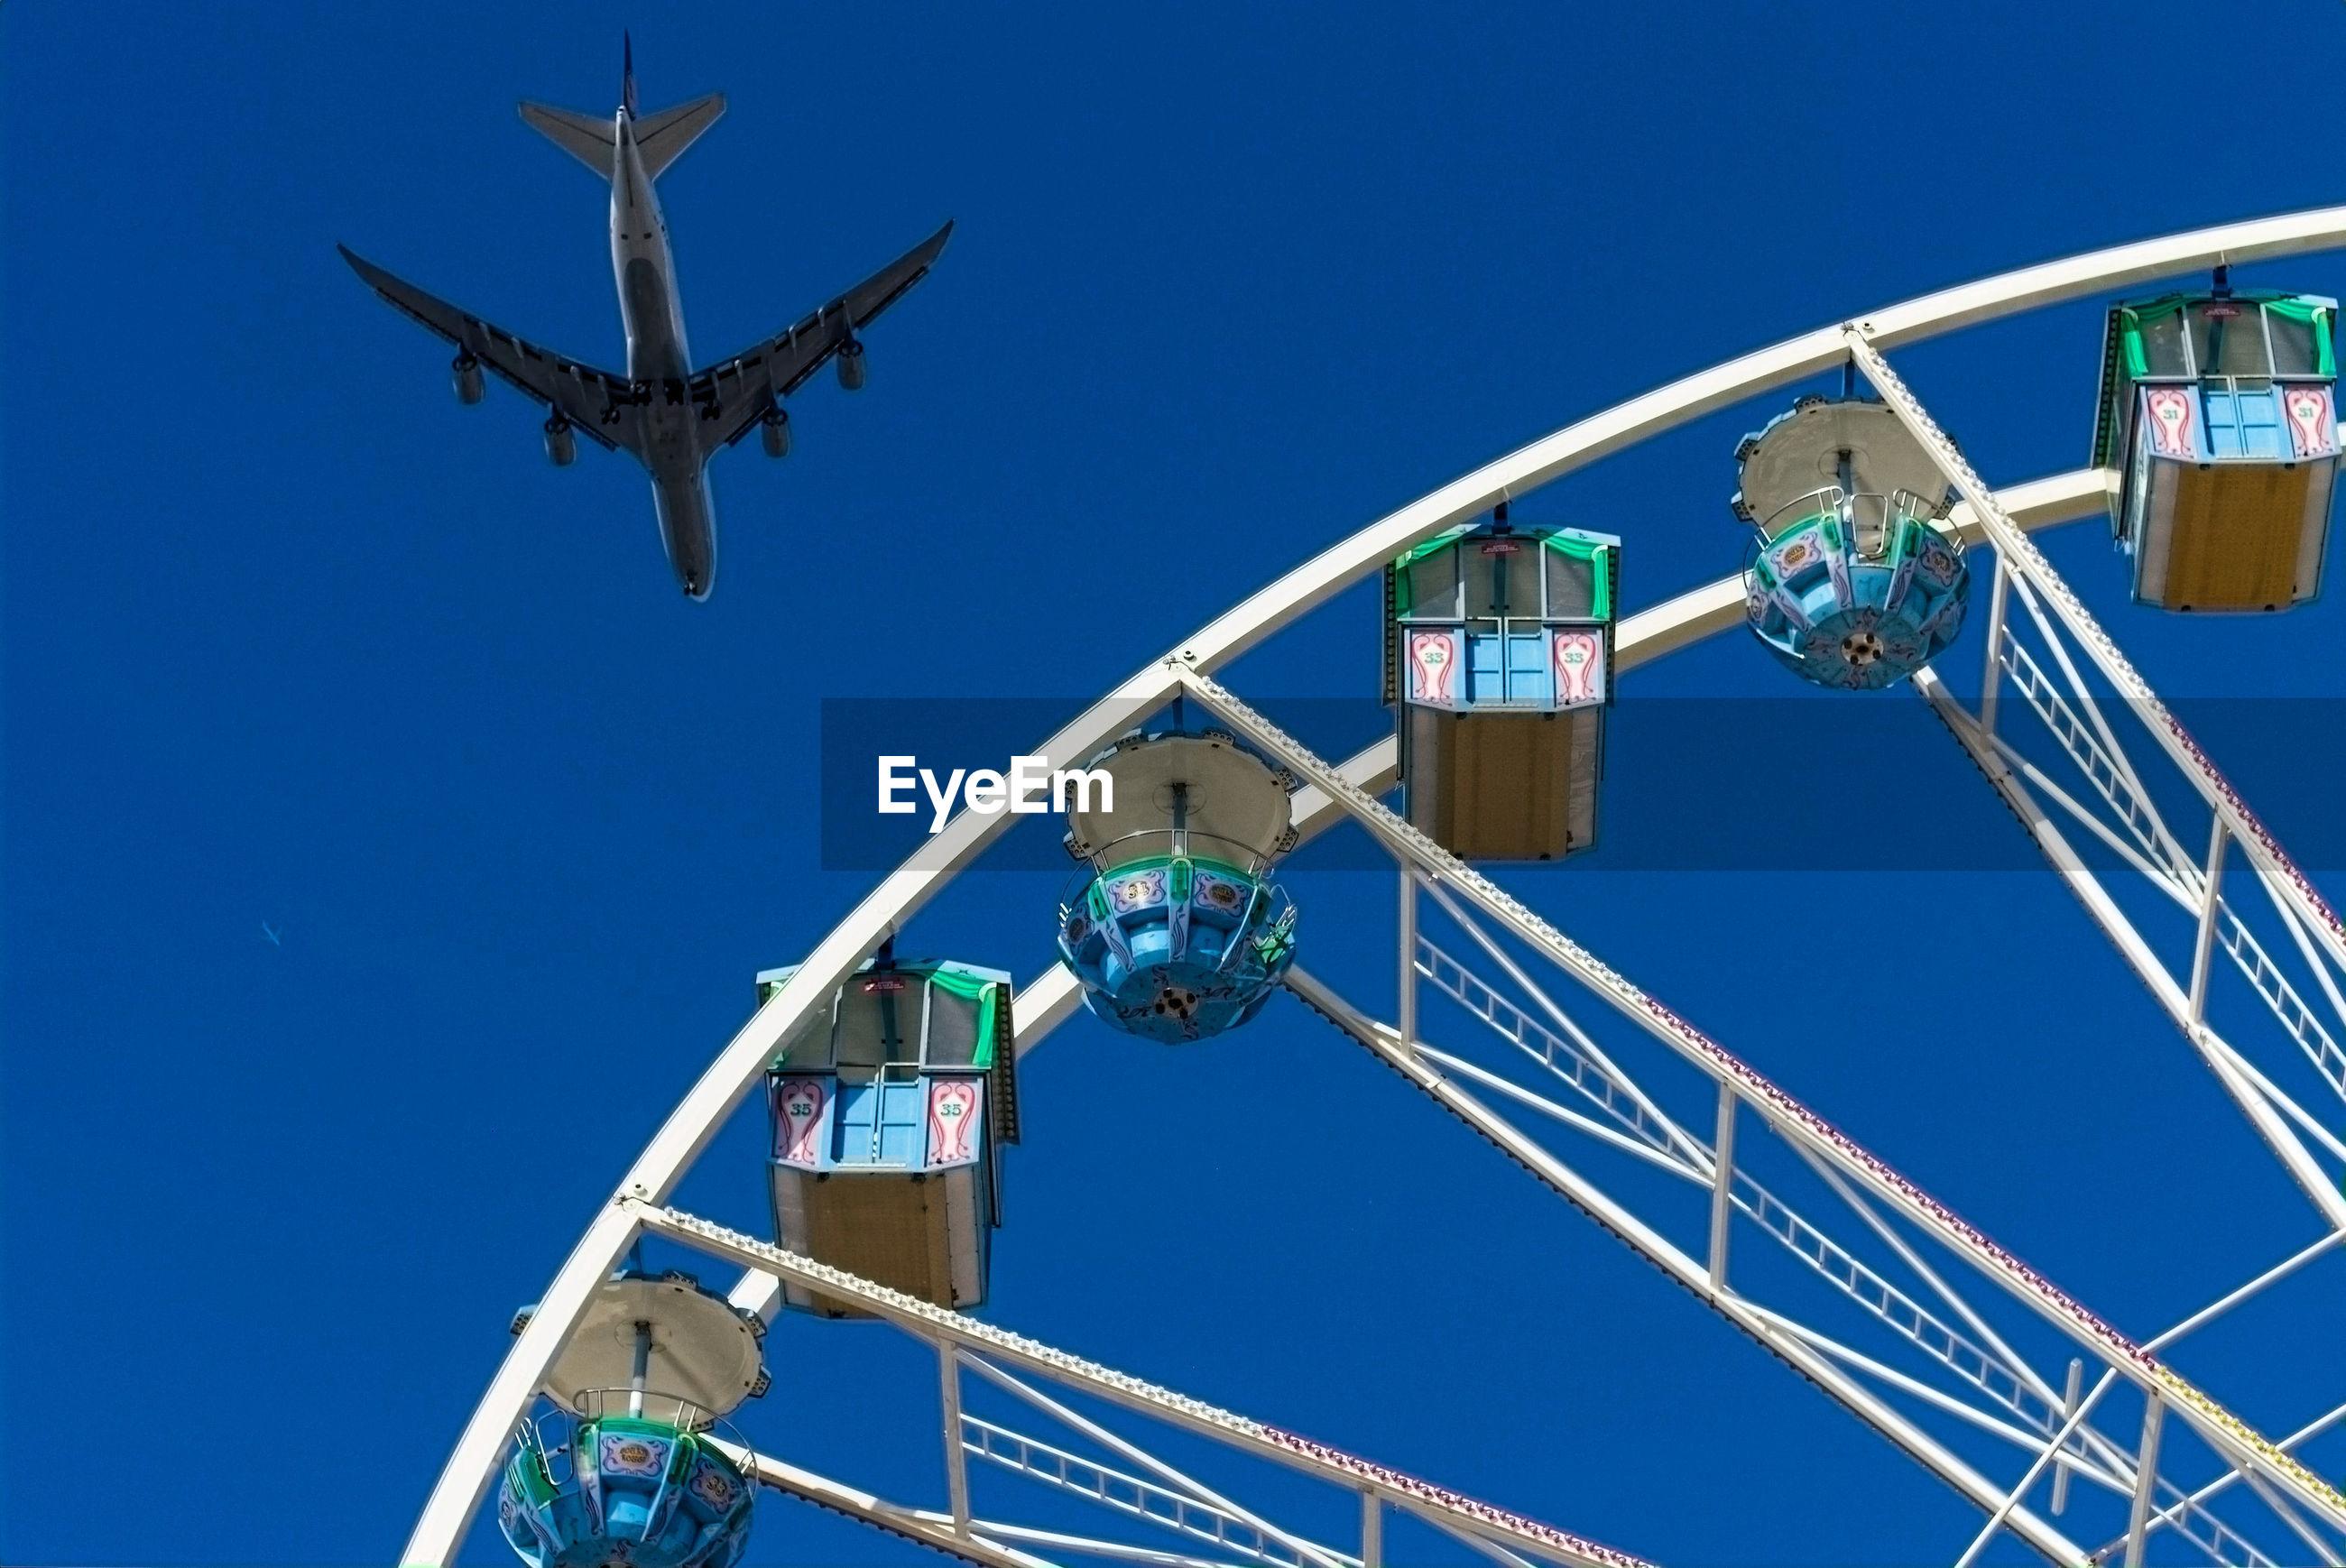 LOW ANGLE VIEW OF AMUSEMENT PARK RIDE AGAINST BLUE SKY